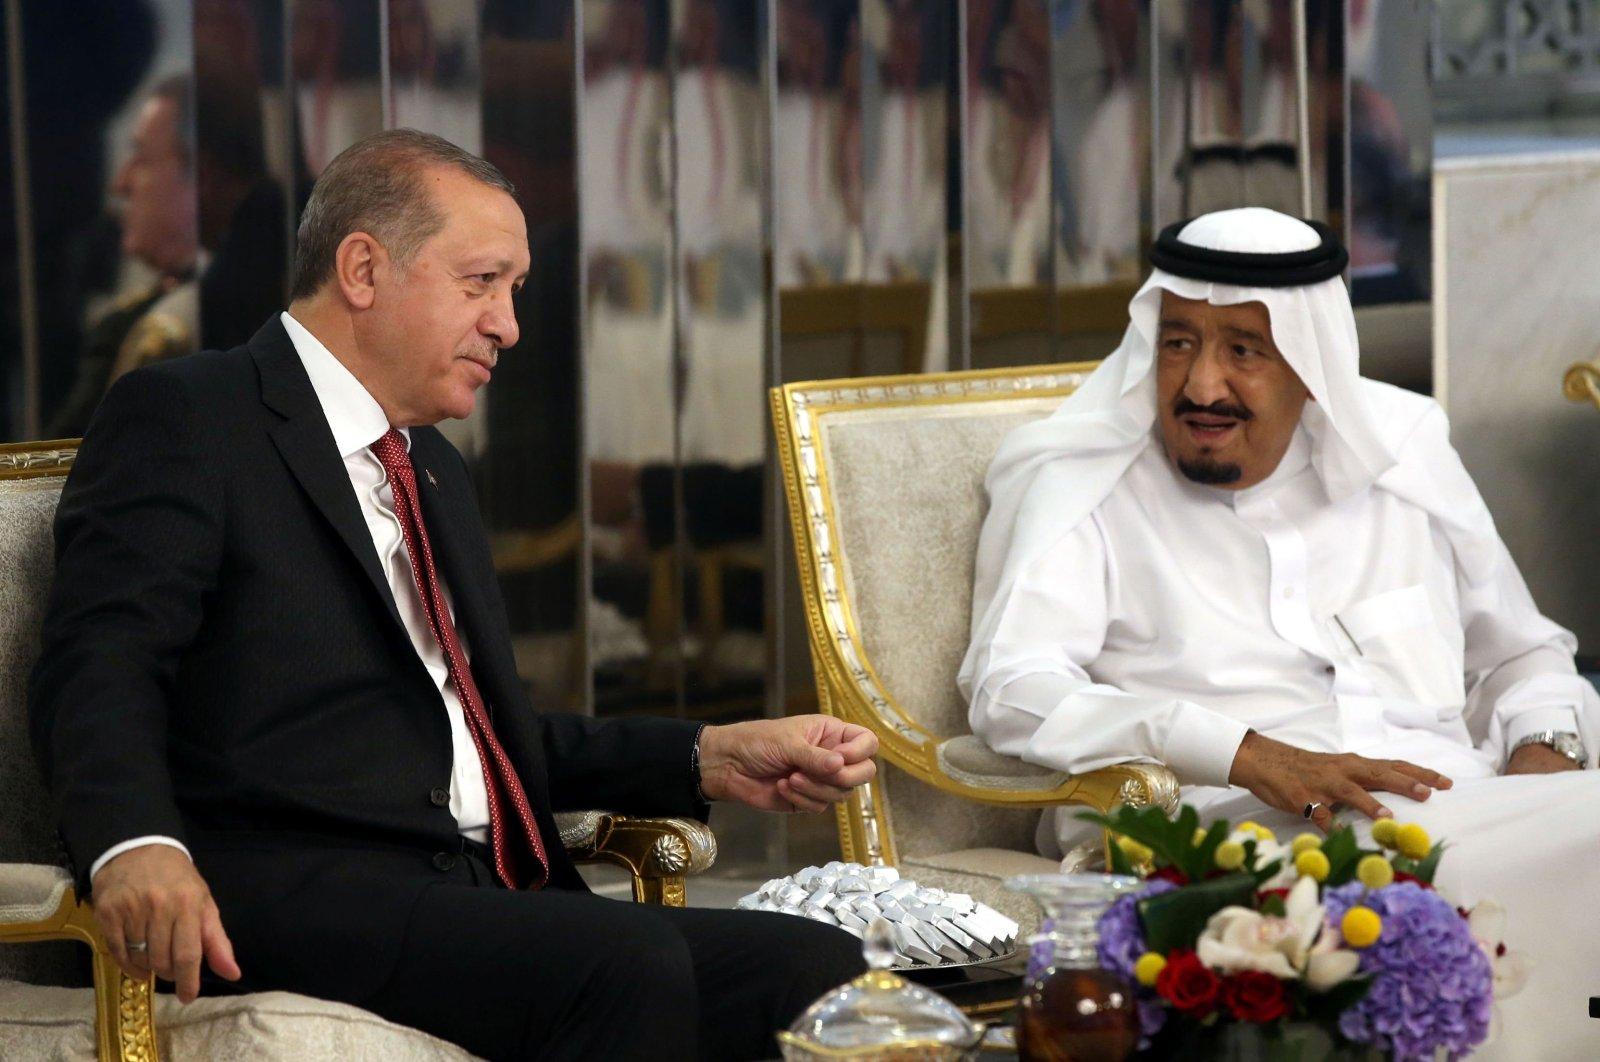 President Recep Tayyip Erdoğan and Saudi Arabia's King Salman bin Abdulaziz Al Saud talk during an official meeting in Jeddah, Saudi Arabia, July 23, 2017. (AFP Photo)